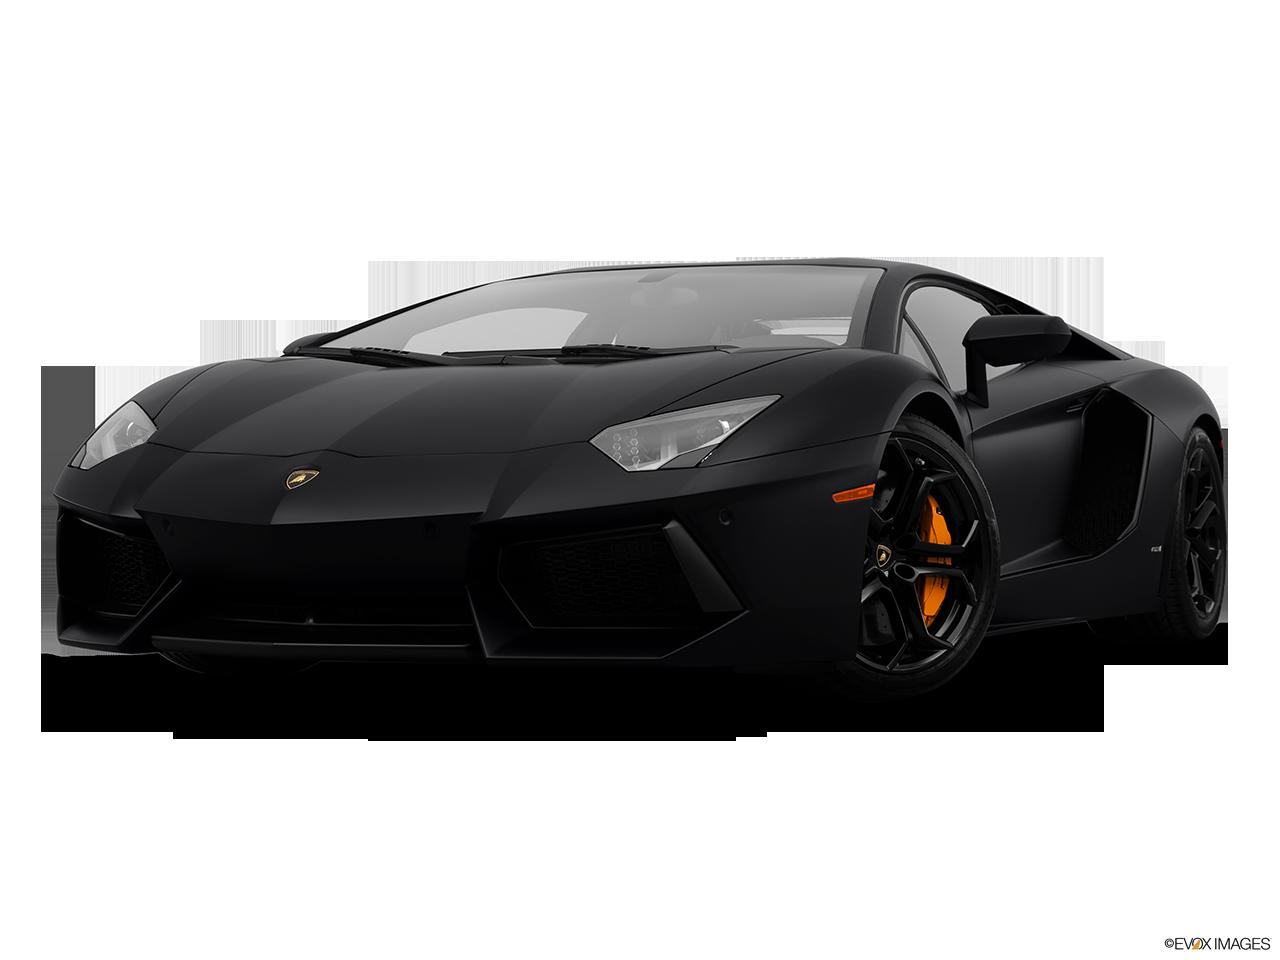 2019 Lamborghini Aventador photo